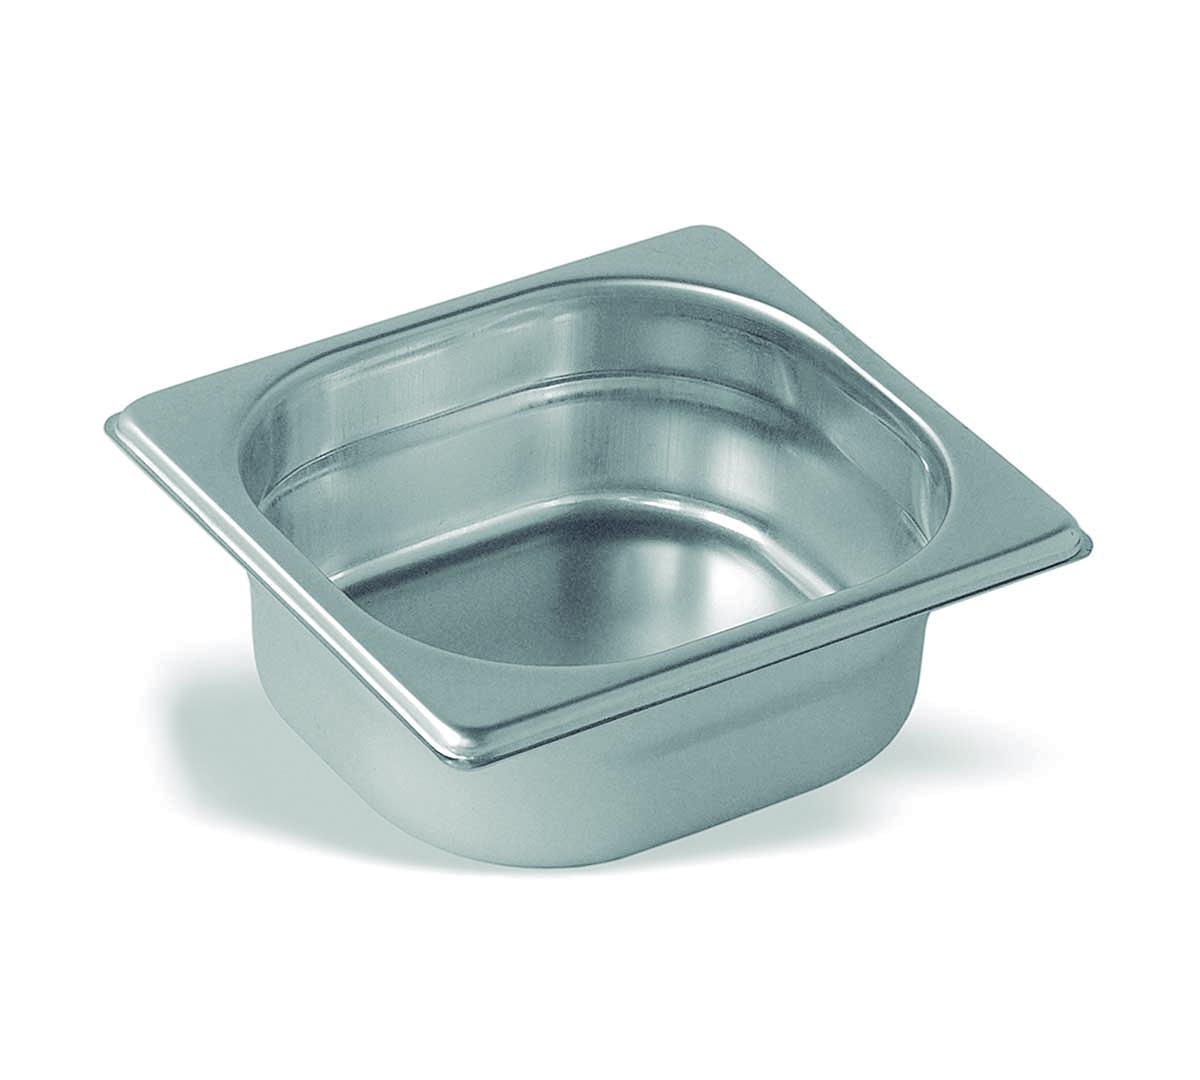 Cubeta Gastronorm 176x162 mm